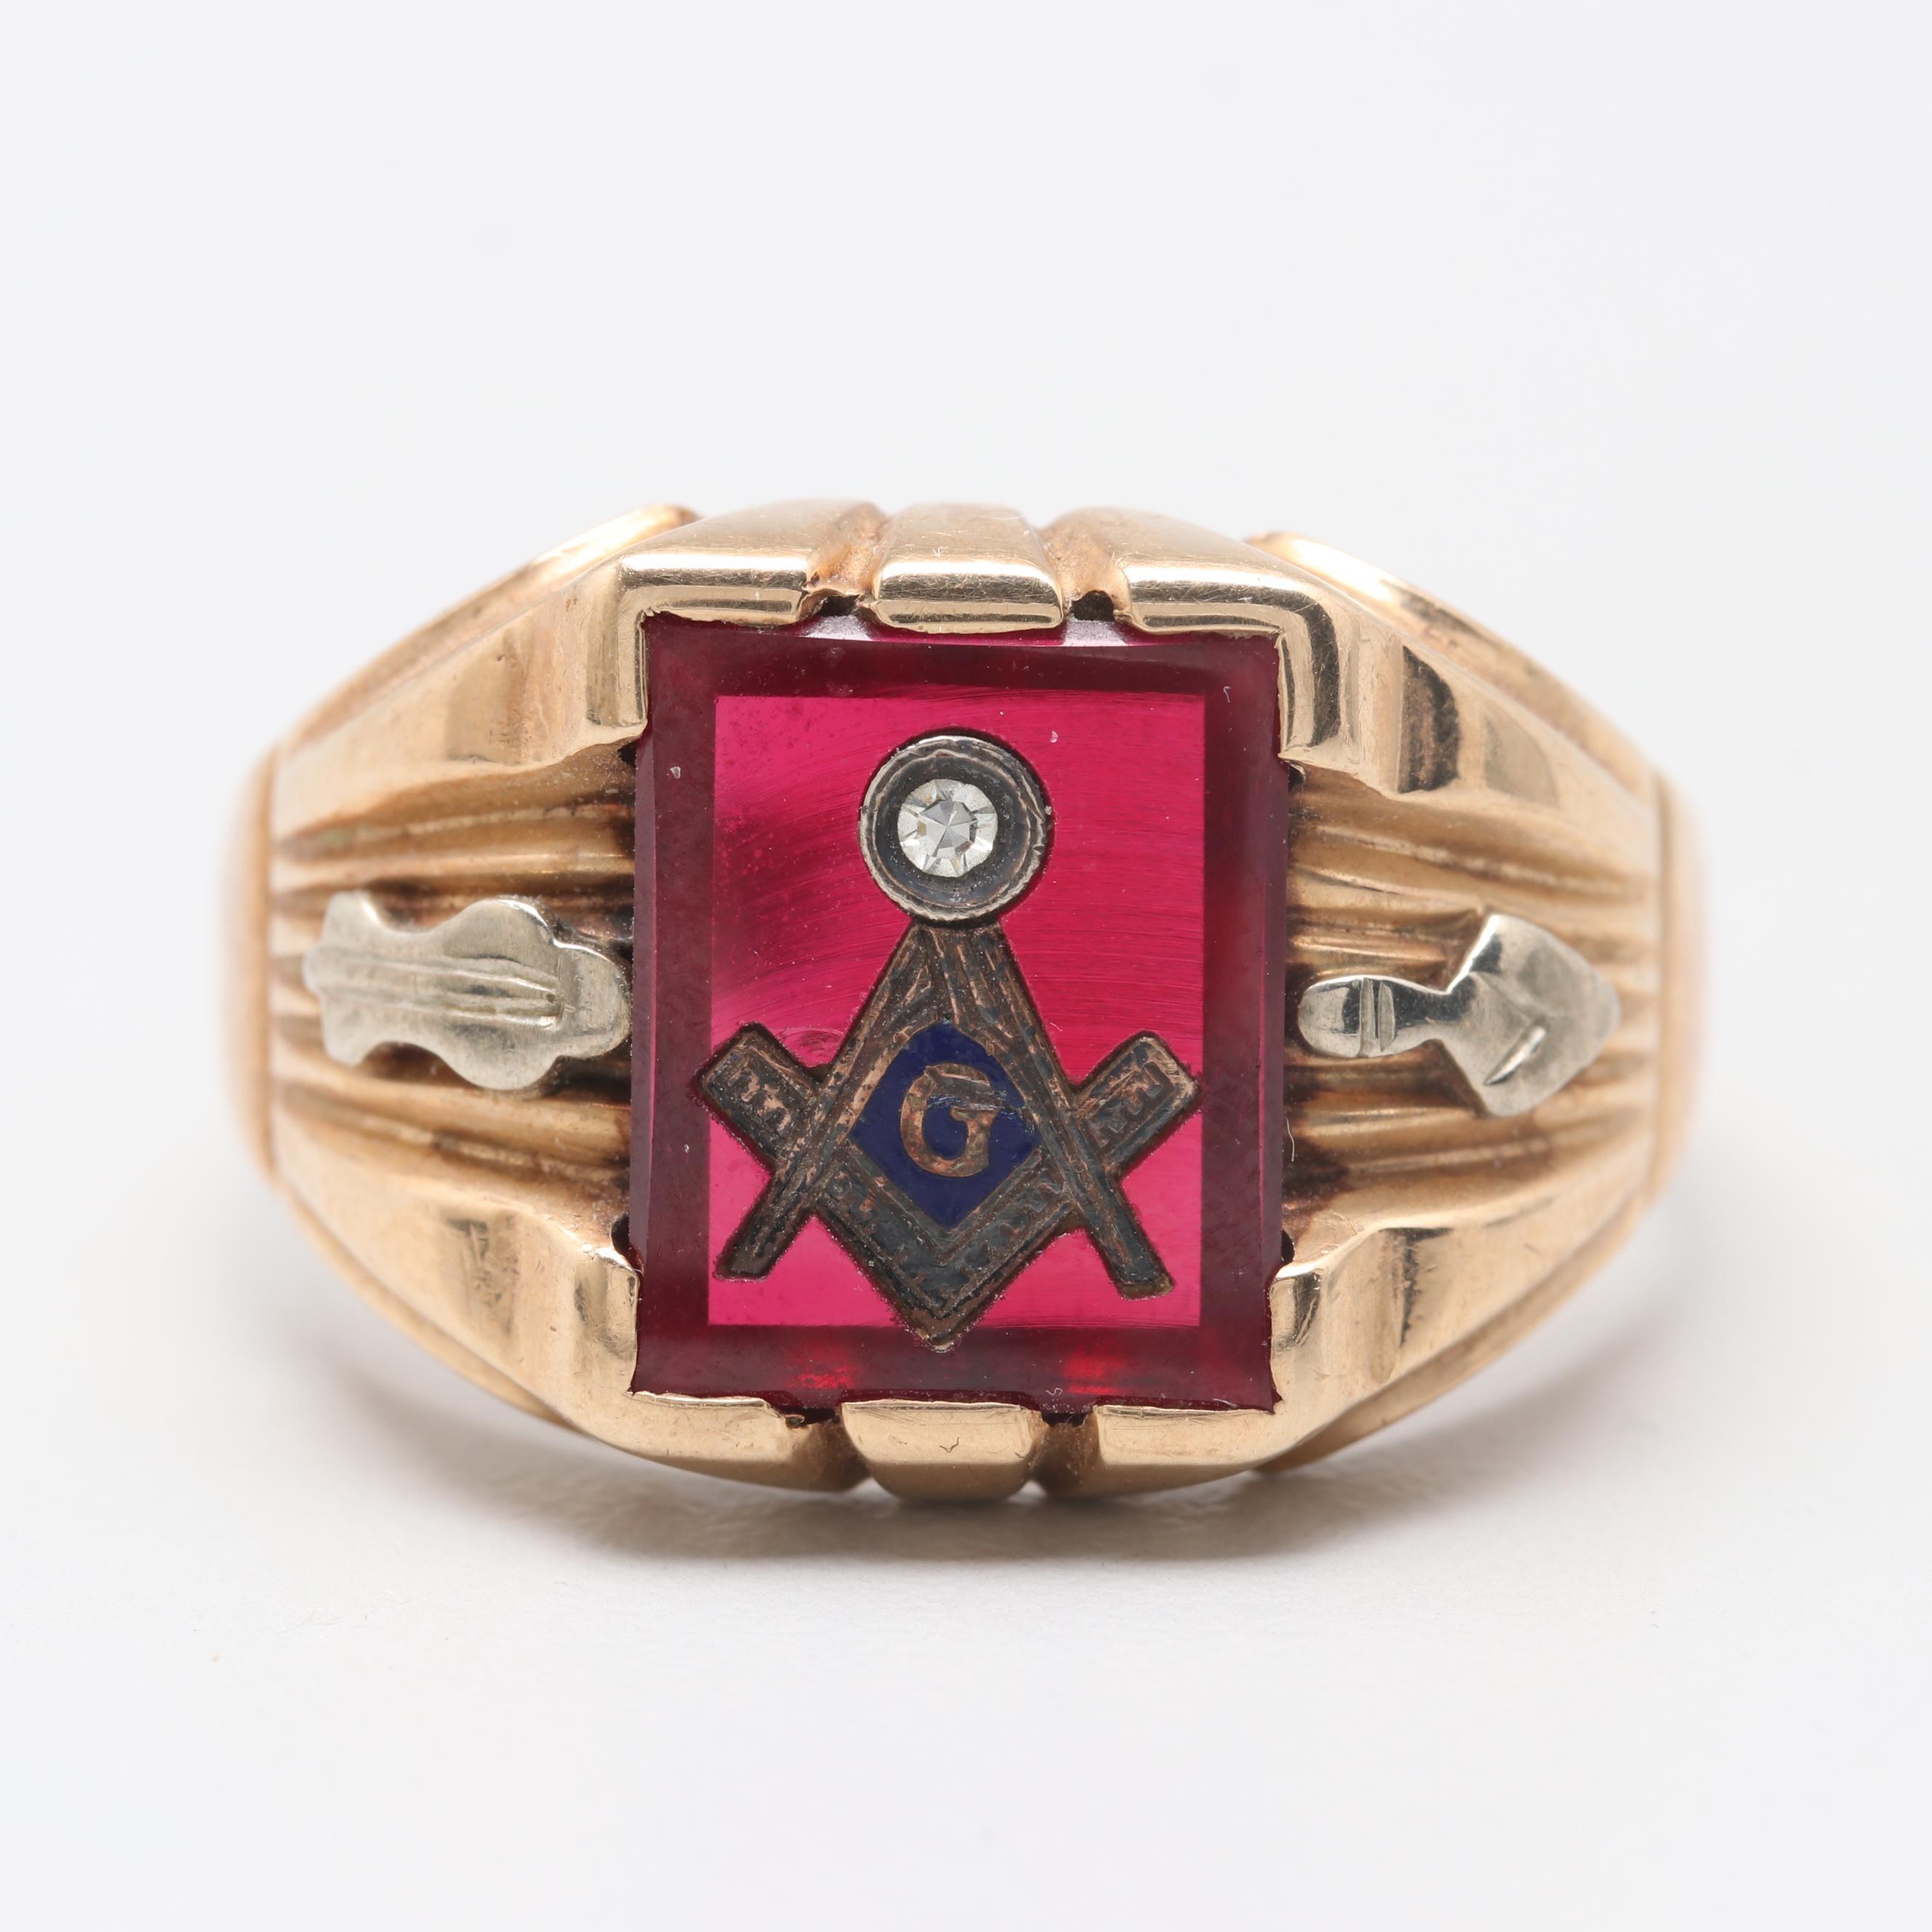 10K Yellow Gold Masonic Synthetic Ruby and Diamond Ring